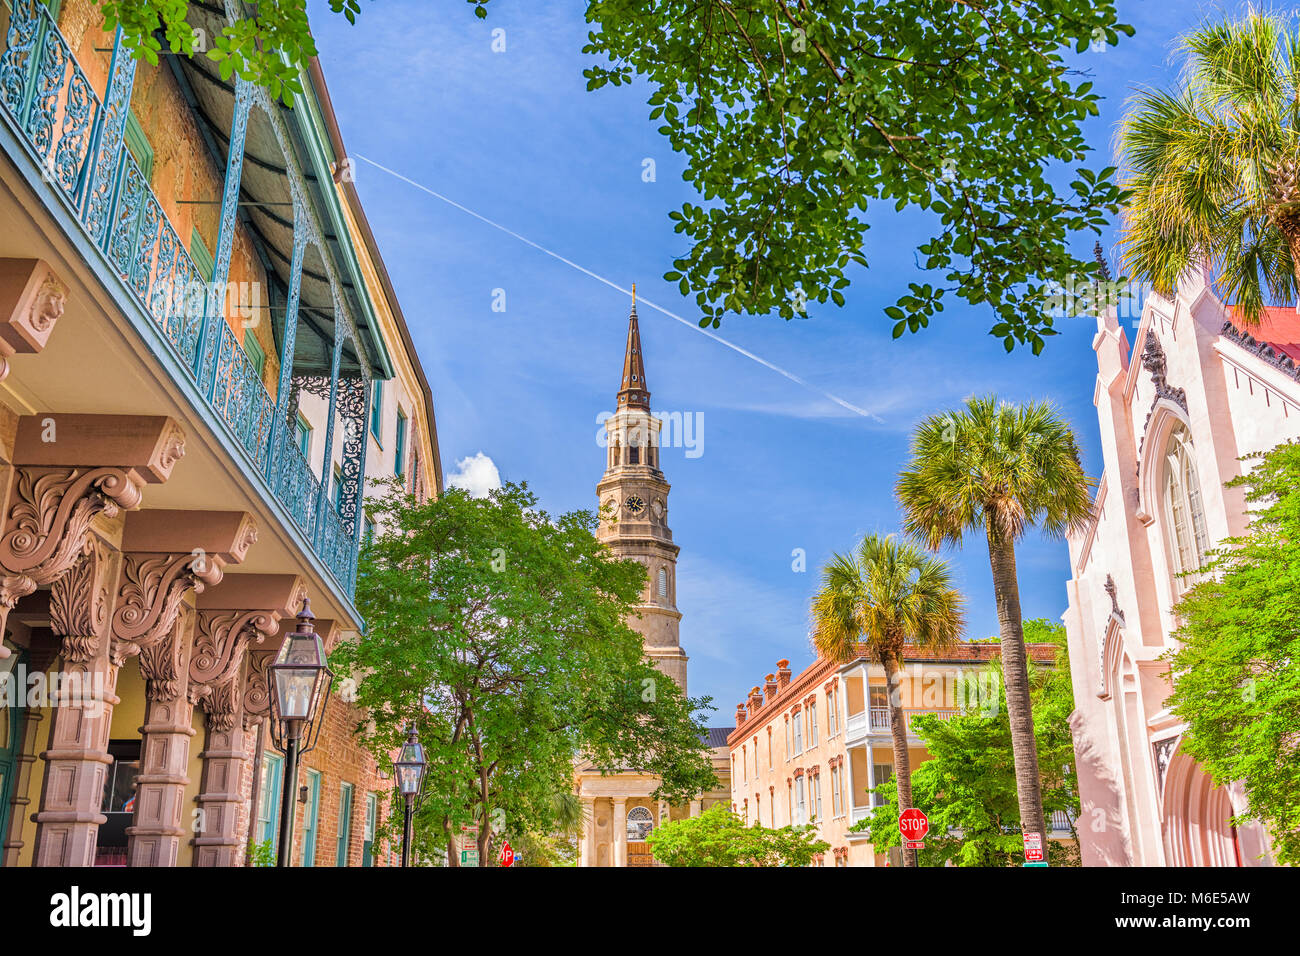 Charleston, South Carolina, USA historic downtown cityscape. - Stock Image